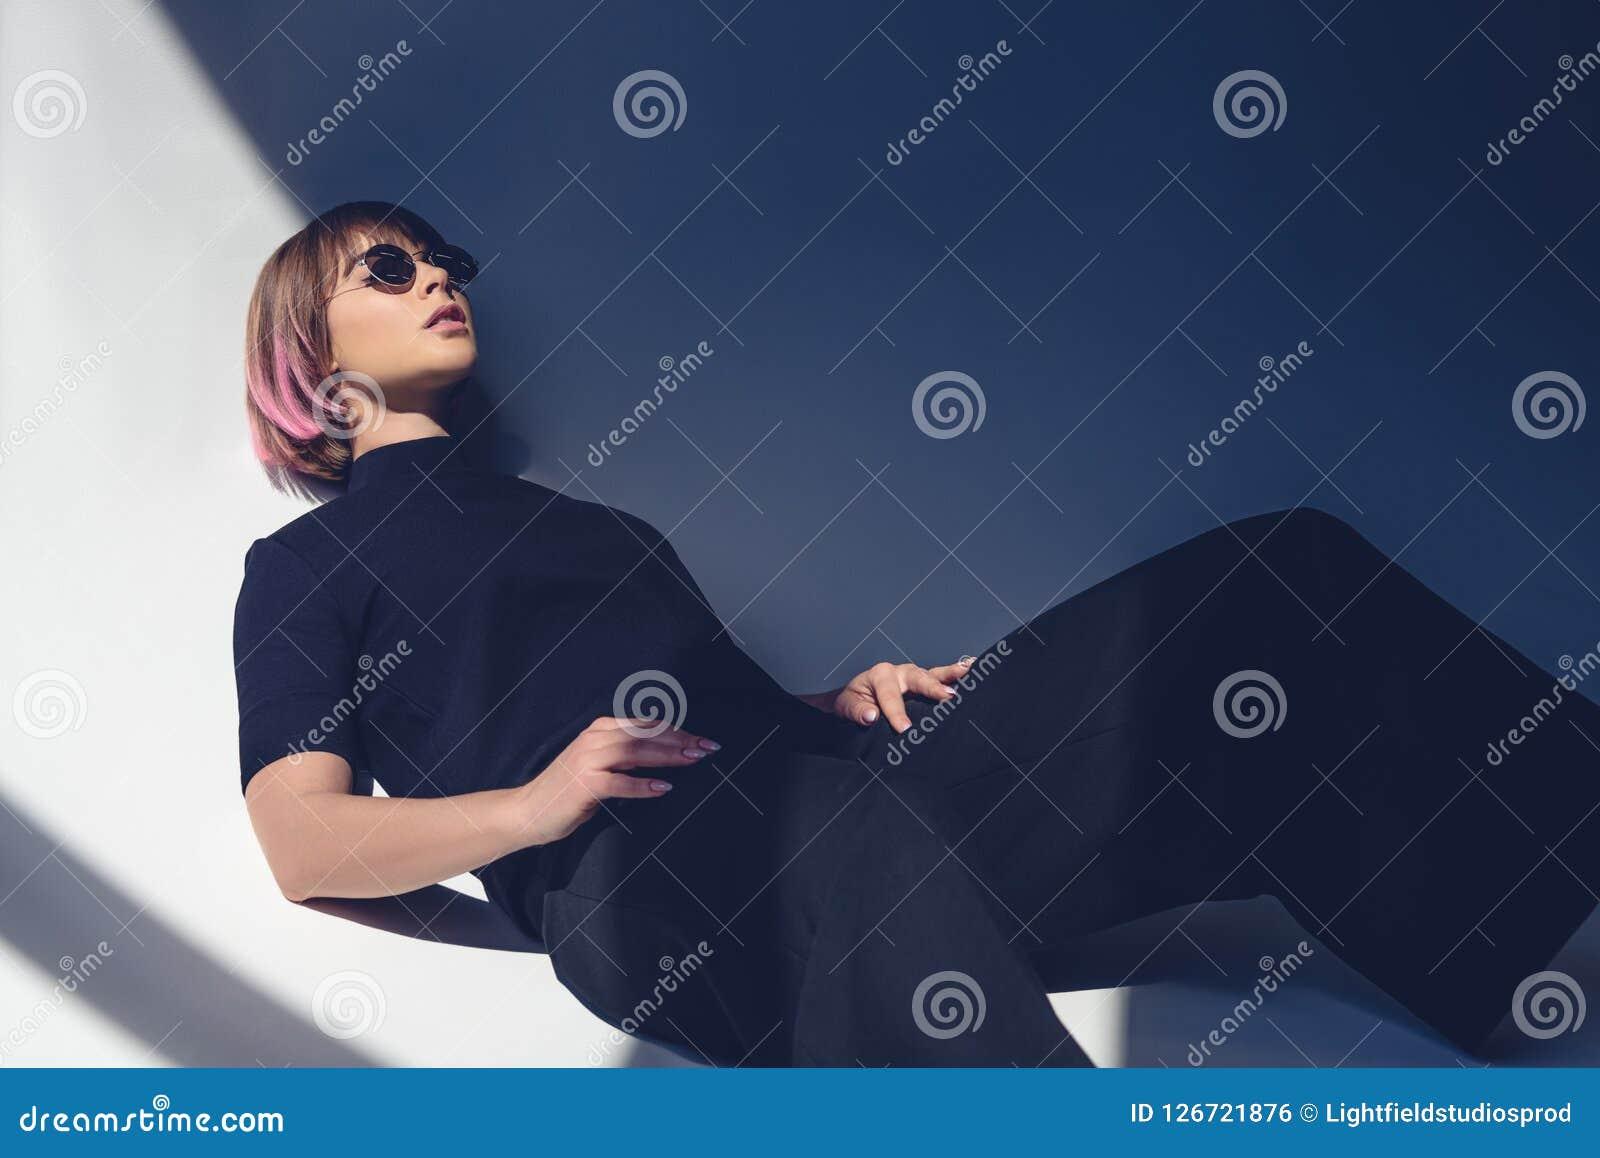 9e70da9a8 Stylish Girl Lying In Black Clothes Stock Photo - Image of stylish ...